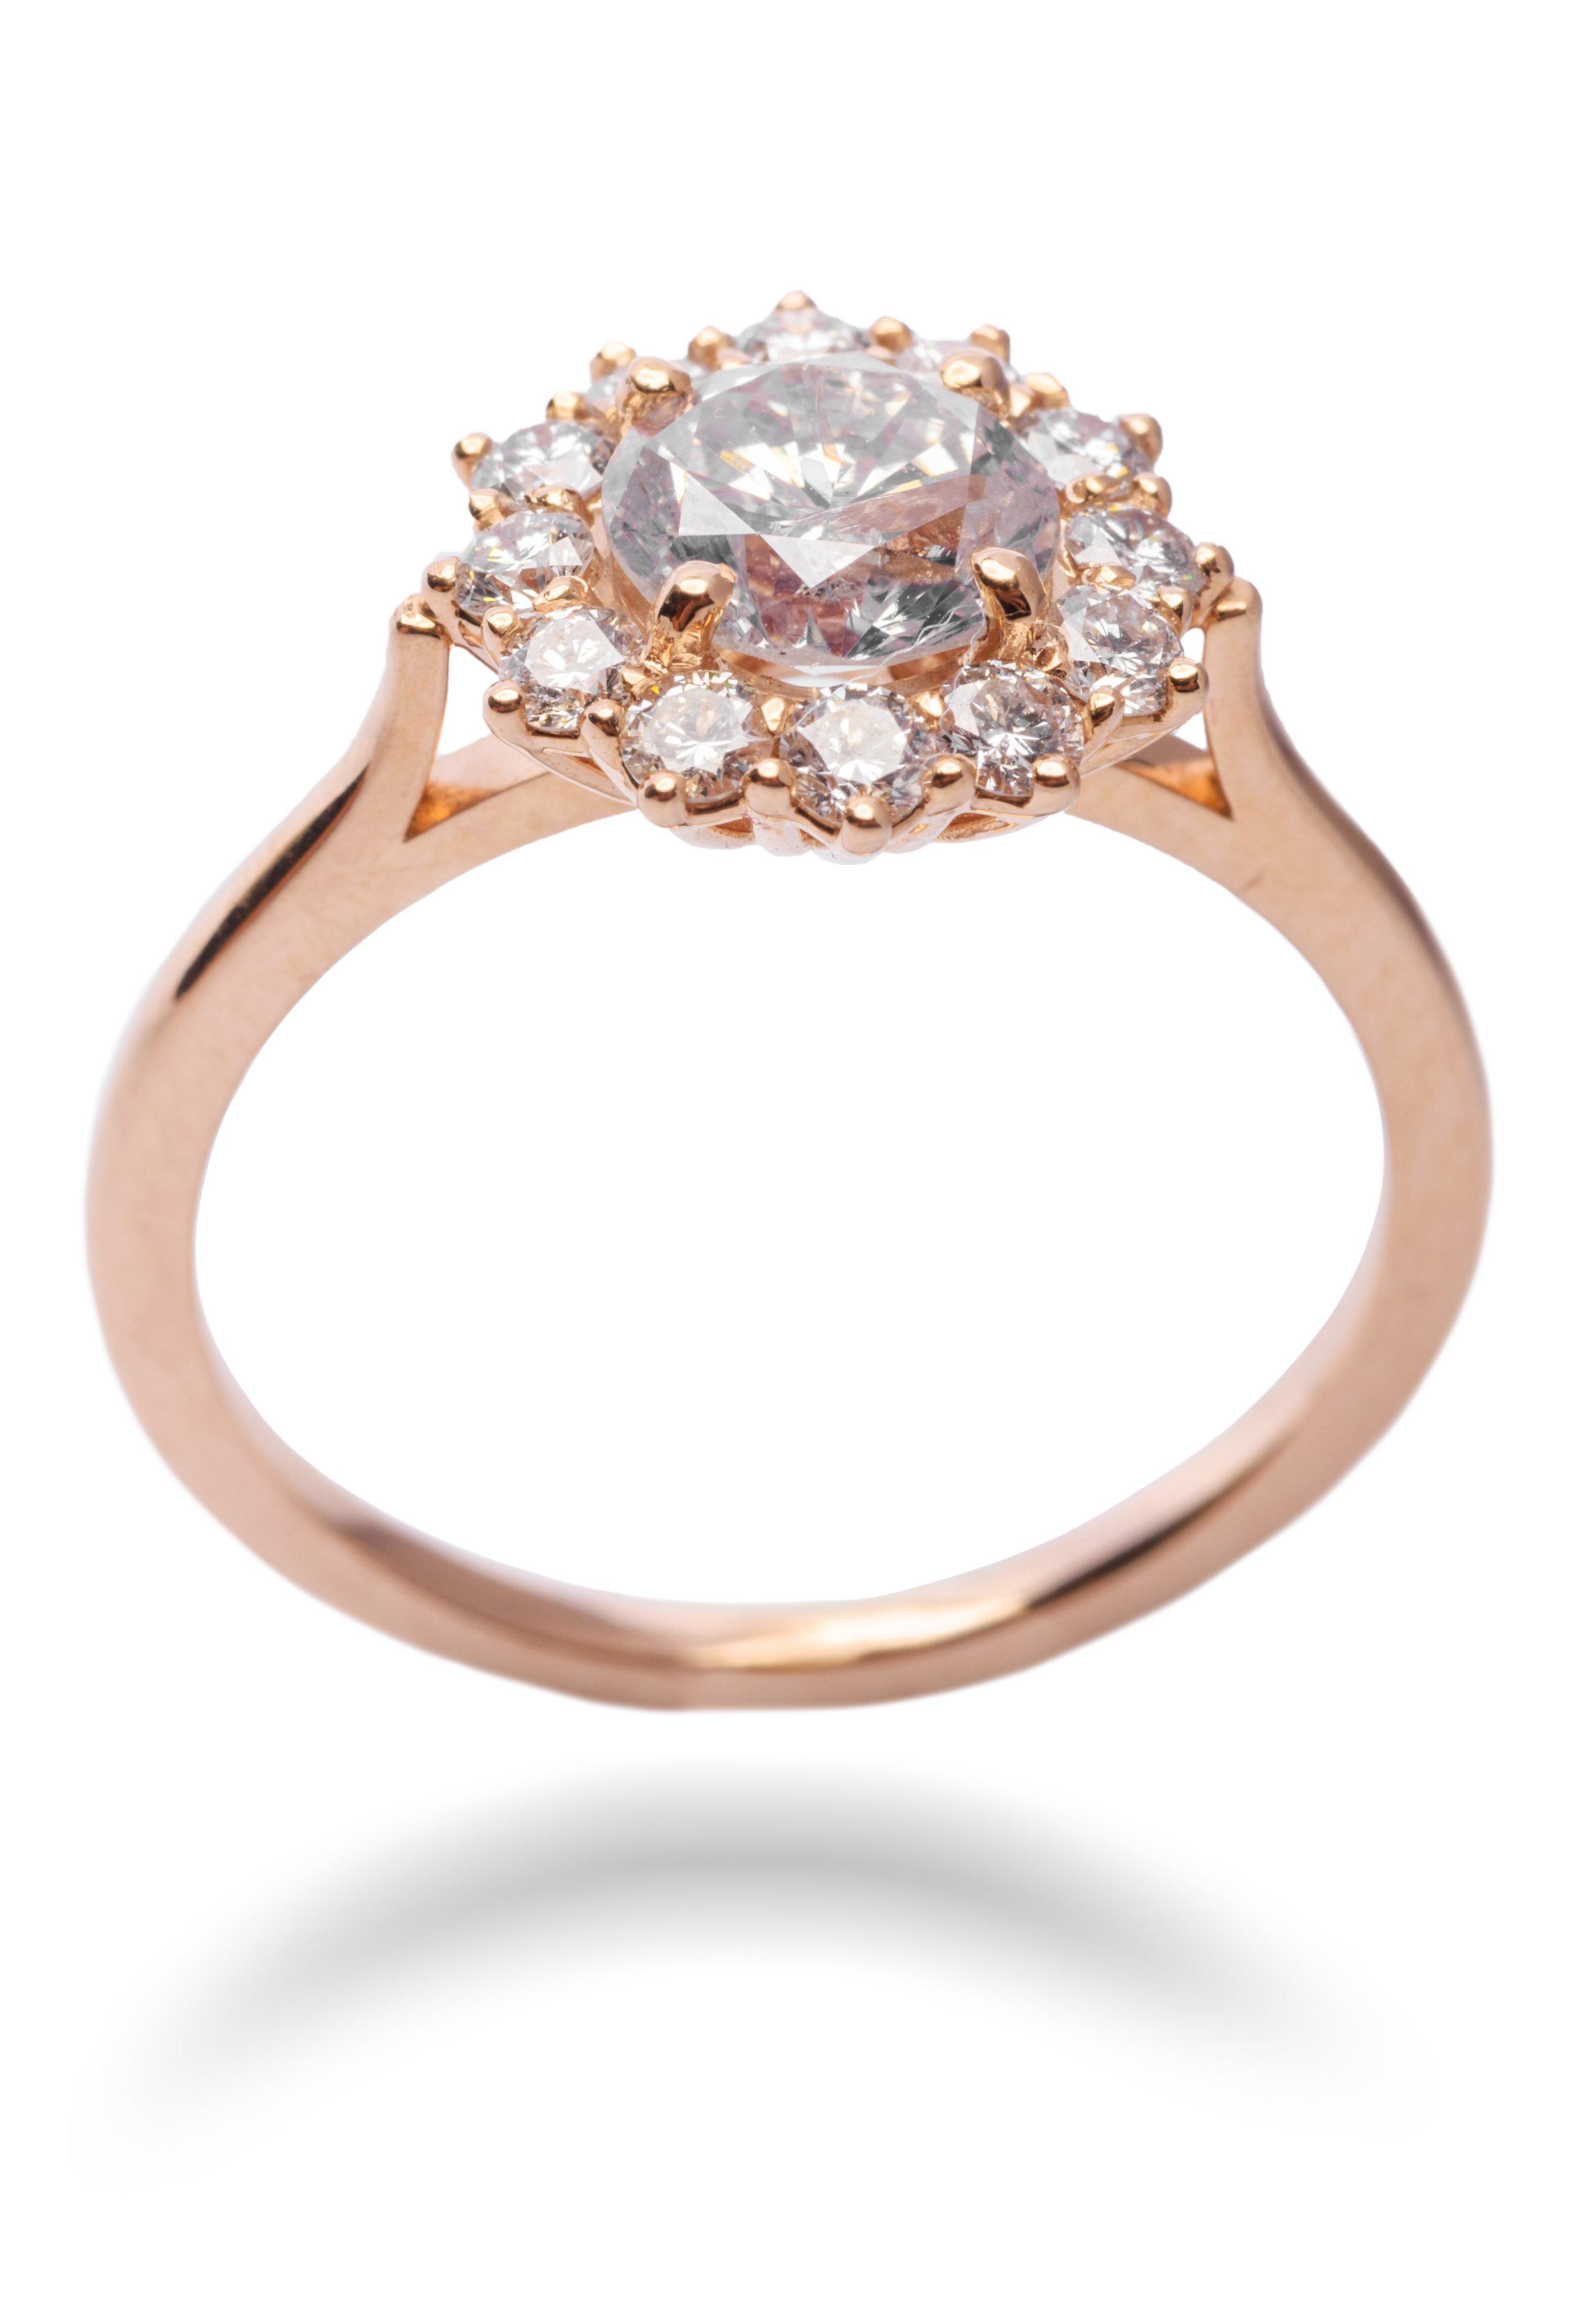 7339_Byzantine_Jewelers_Santa_Cruz_Product_Photography_edit.jpg